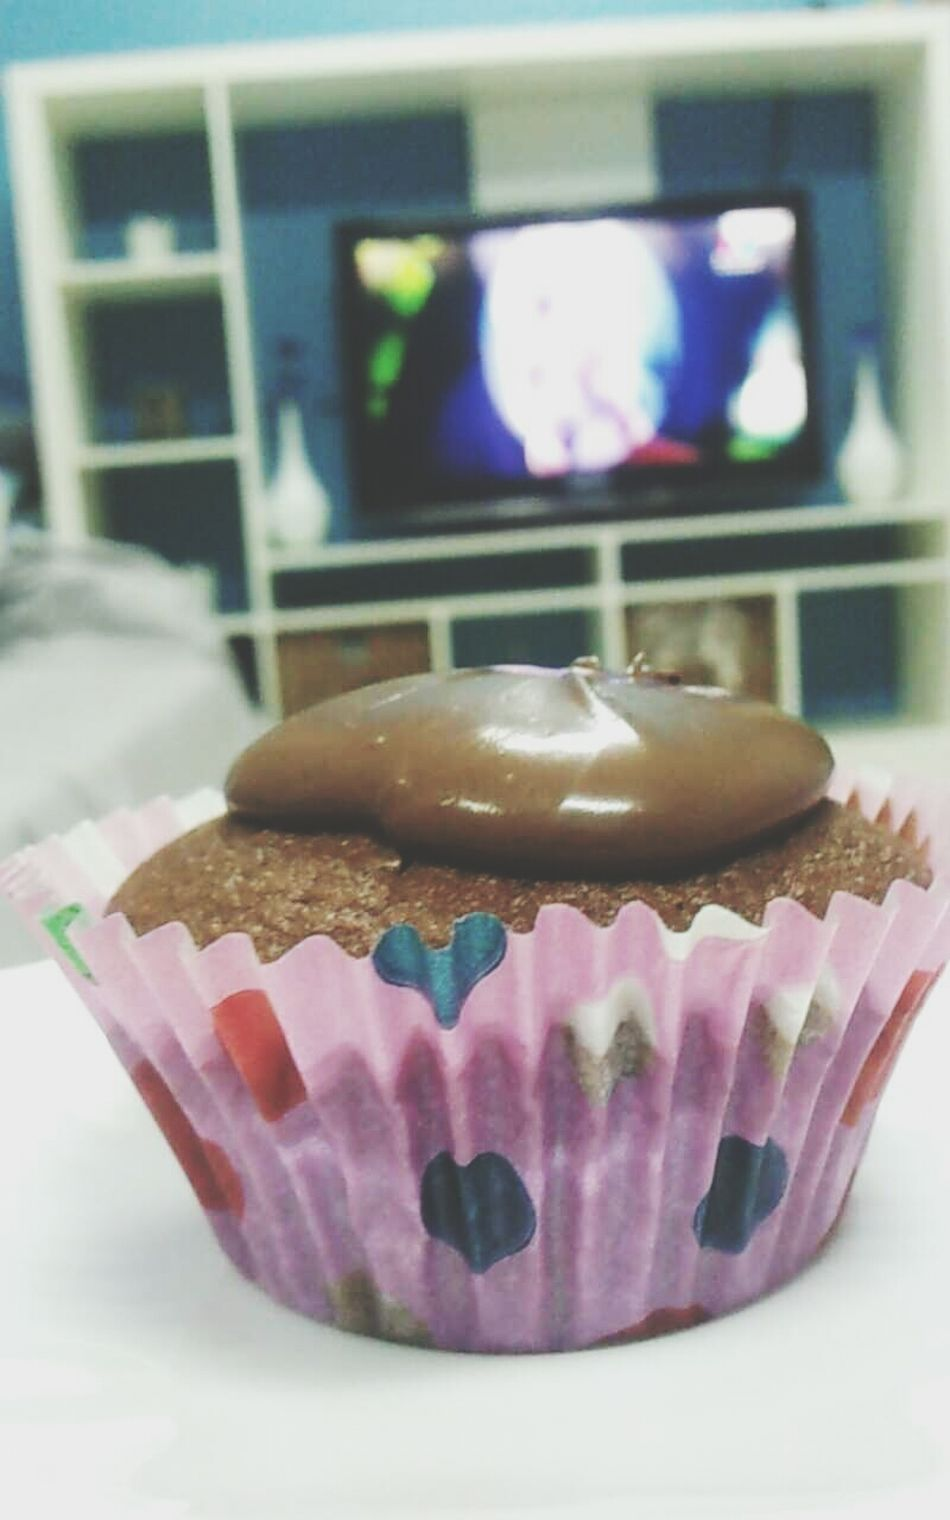 Enjoying Life Sophleeh Chocolate Cake♥ Morning Cake First Eyeem Photo